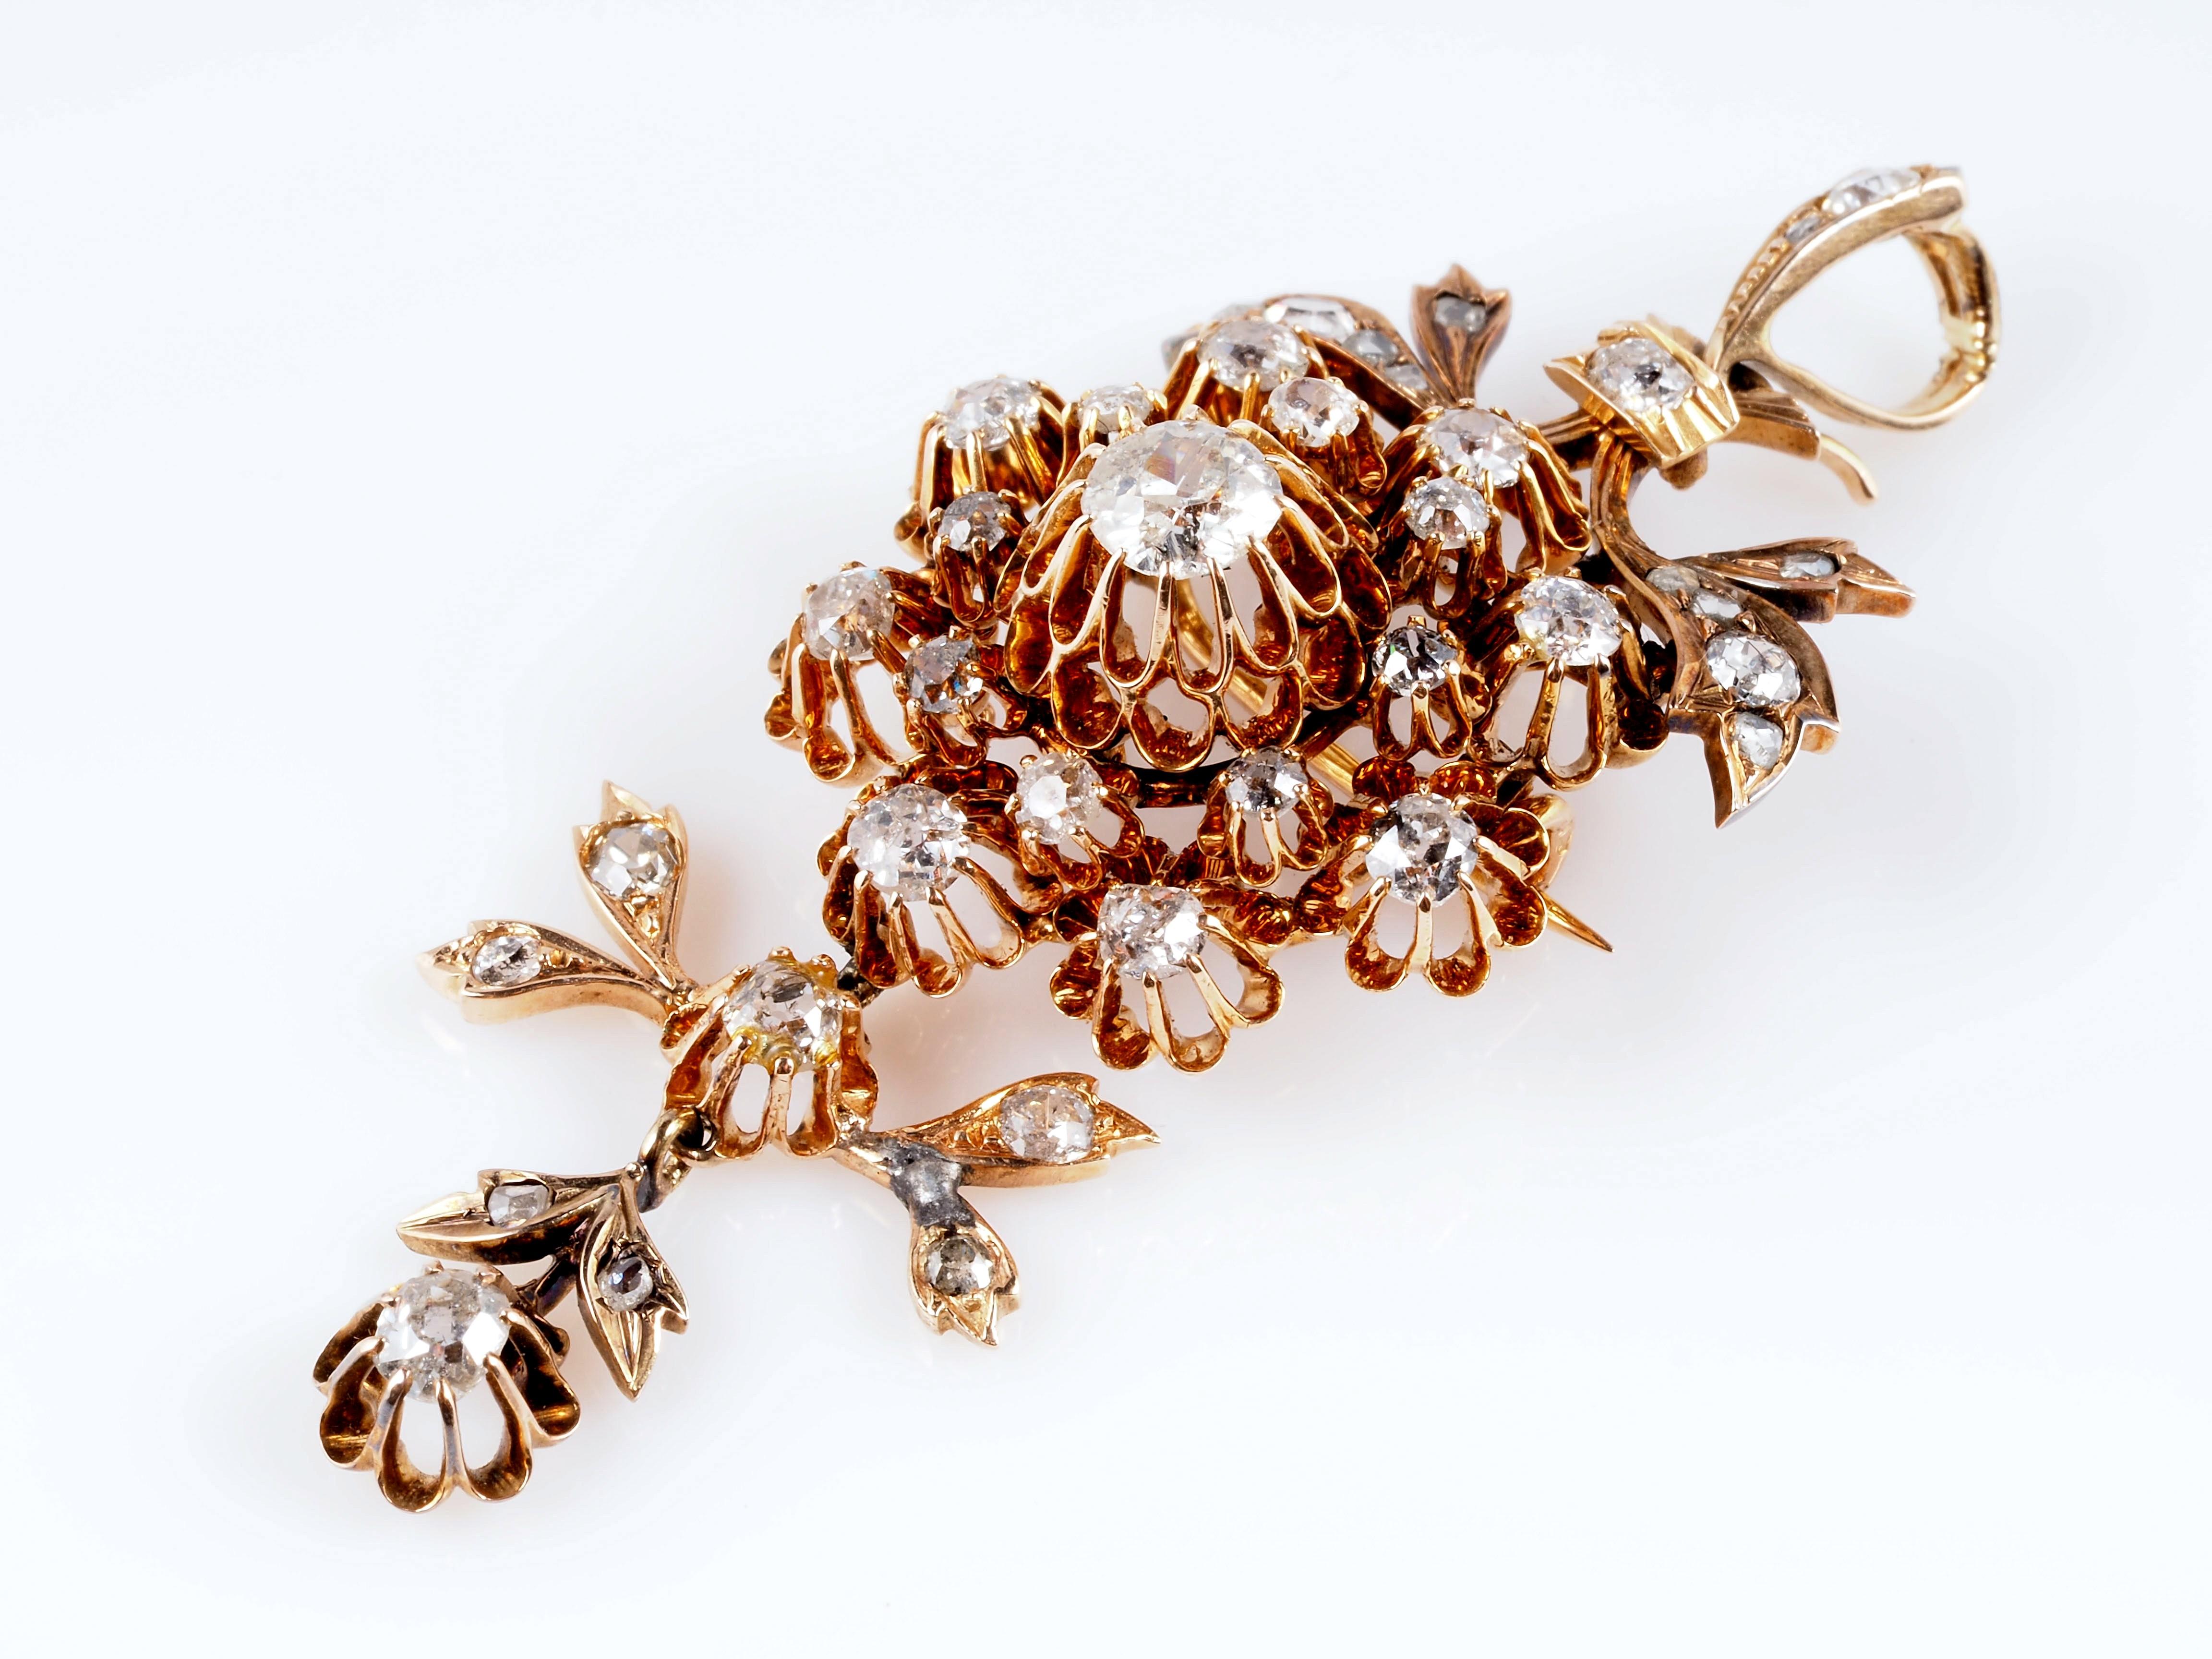 antike brosche anh nger 4 20 karat diamanten 585 gold frankreich um 1880 ebay. Black Bedroom Furniture Sets. Home Design Ideas